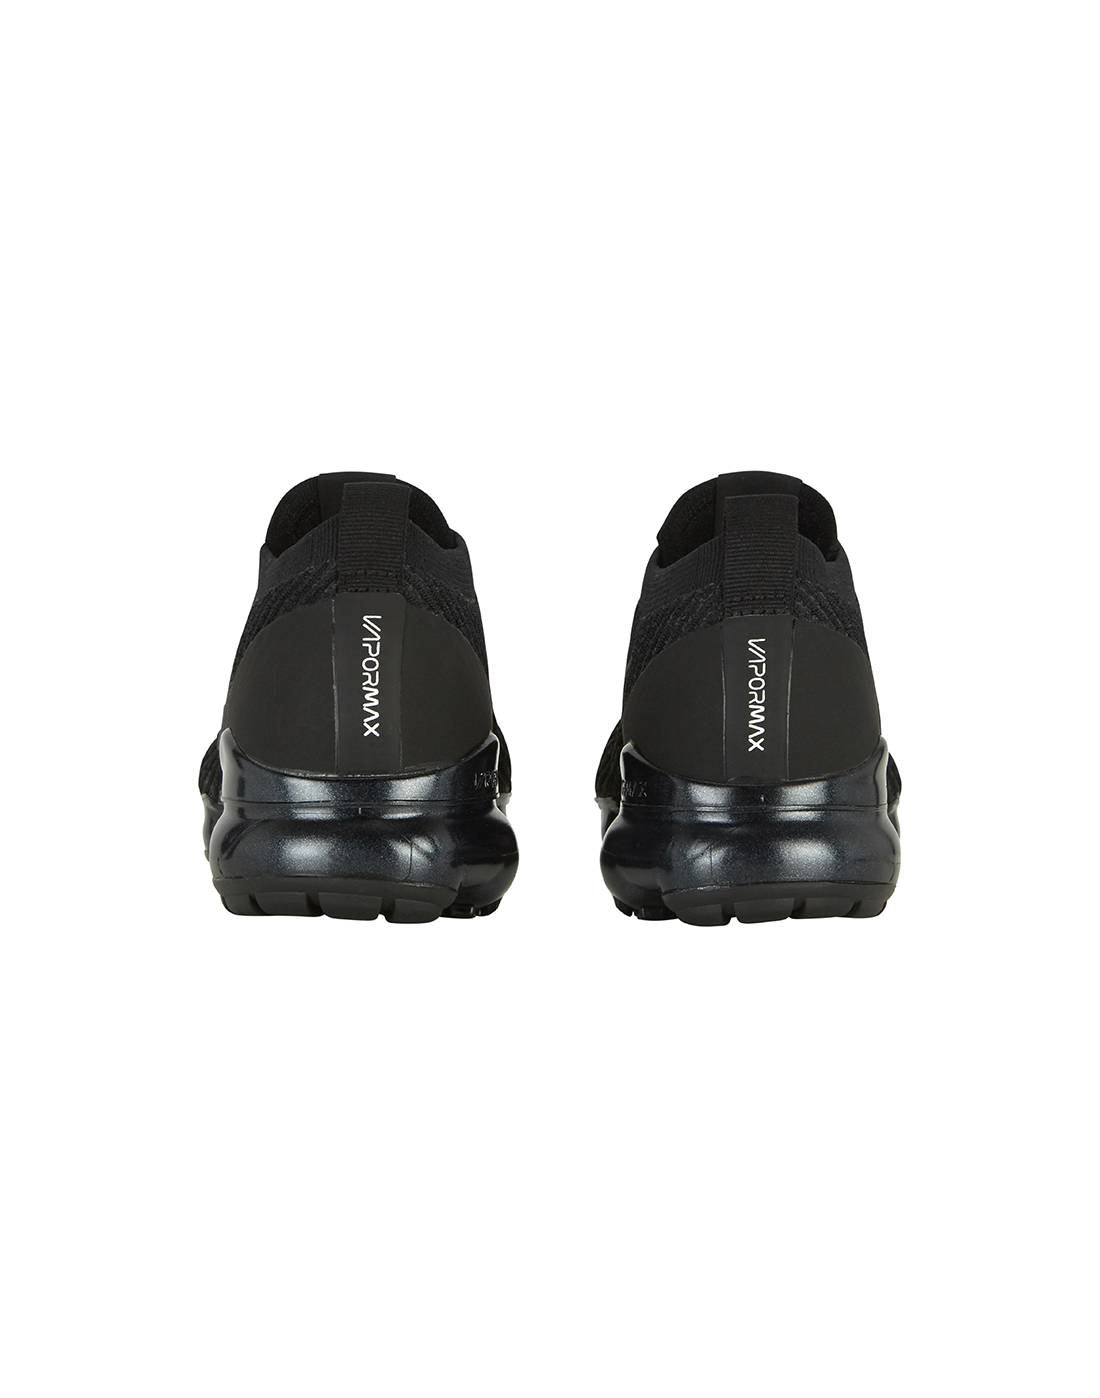 db3a7b6dd0a0d Women s Black Nike Air Vapormax Flyknit 3